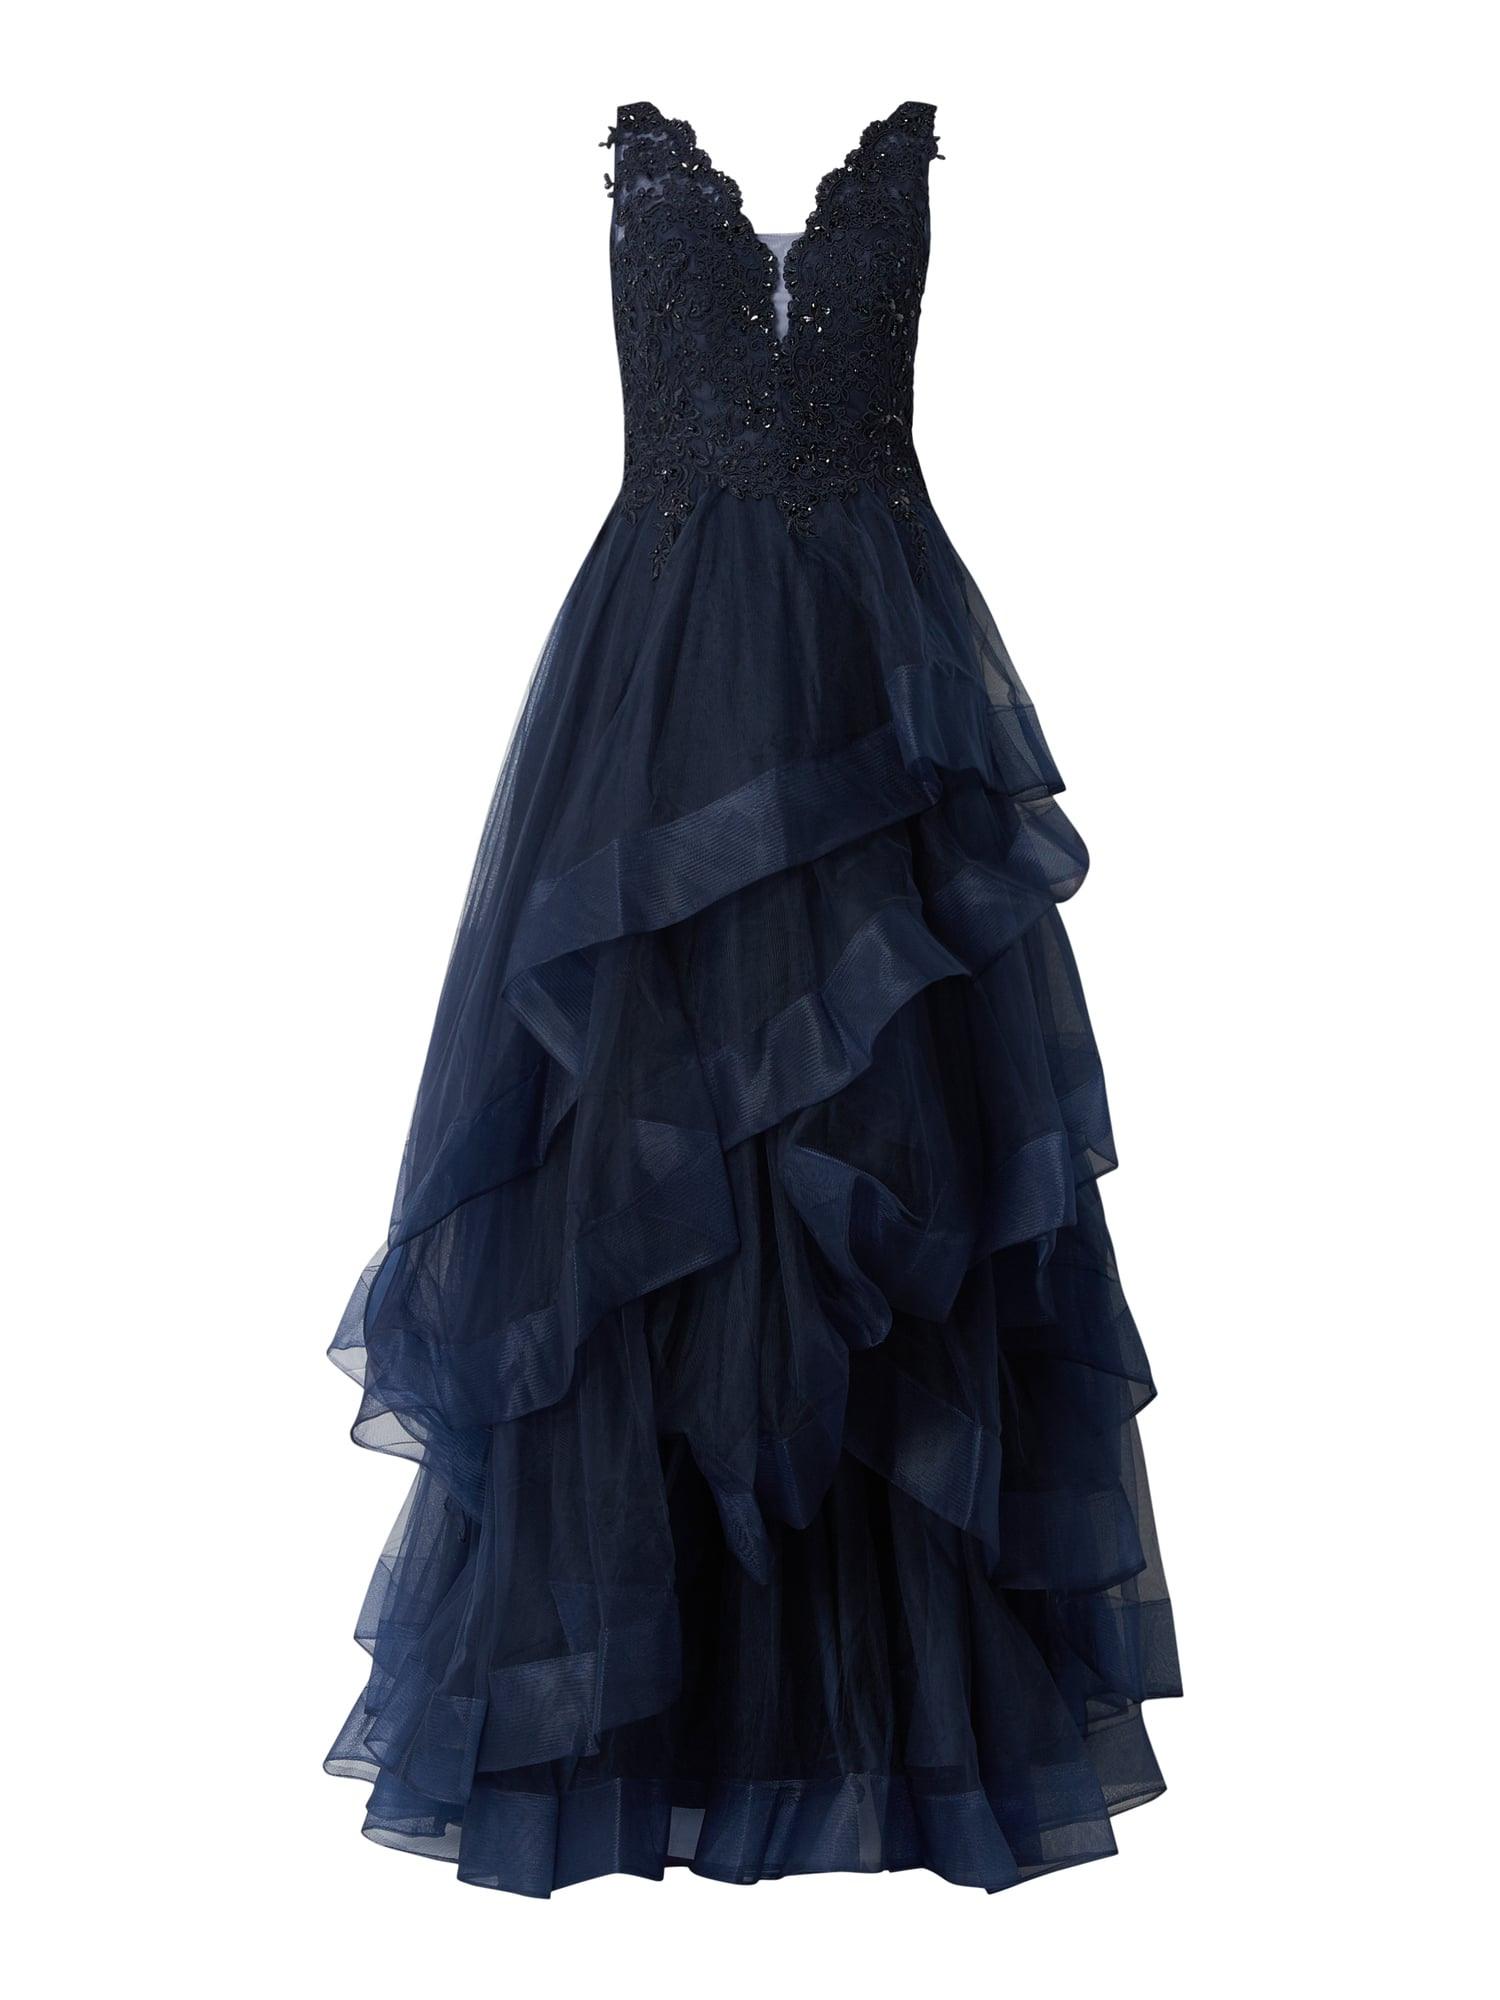 10 Genial Unique Abendkleid Blau VertriebDesigner Schön Unique Abendkleid Blau Galerie